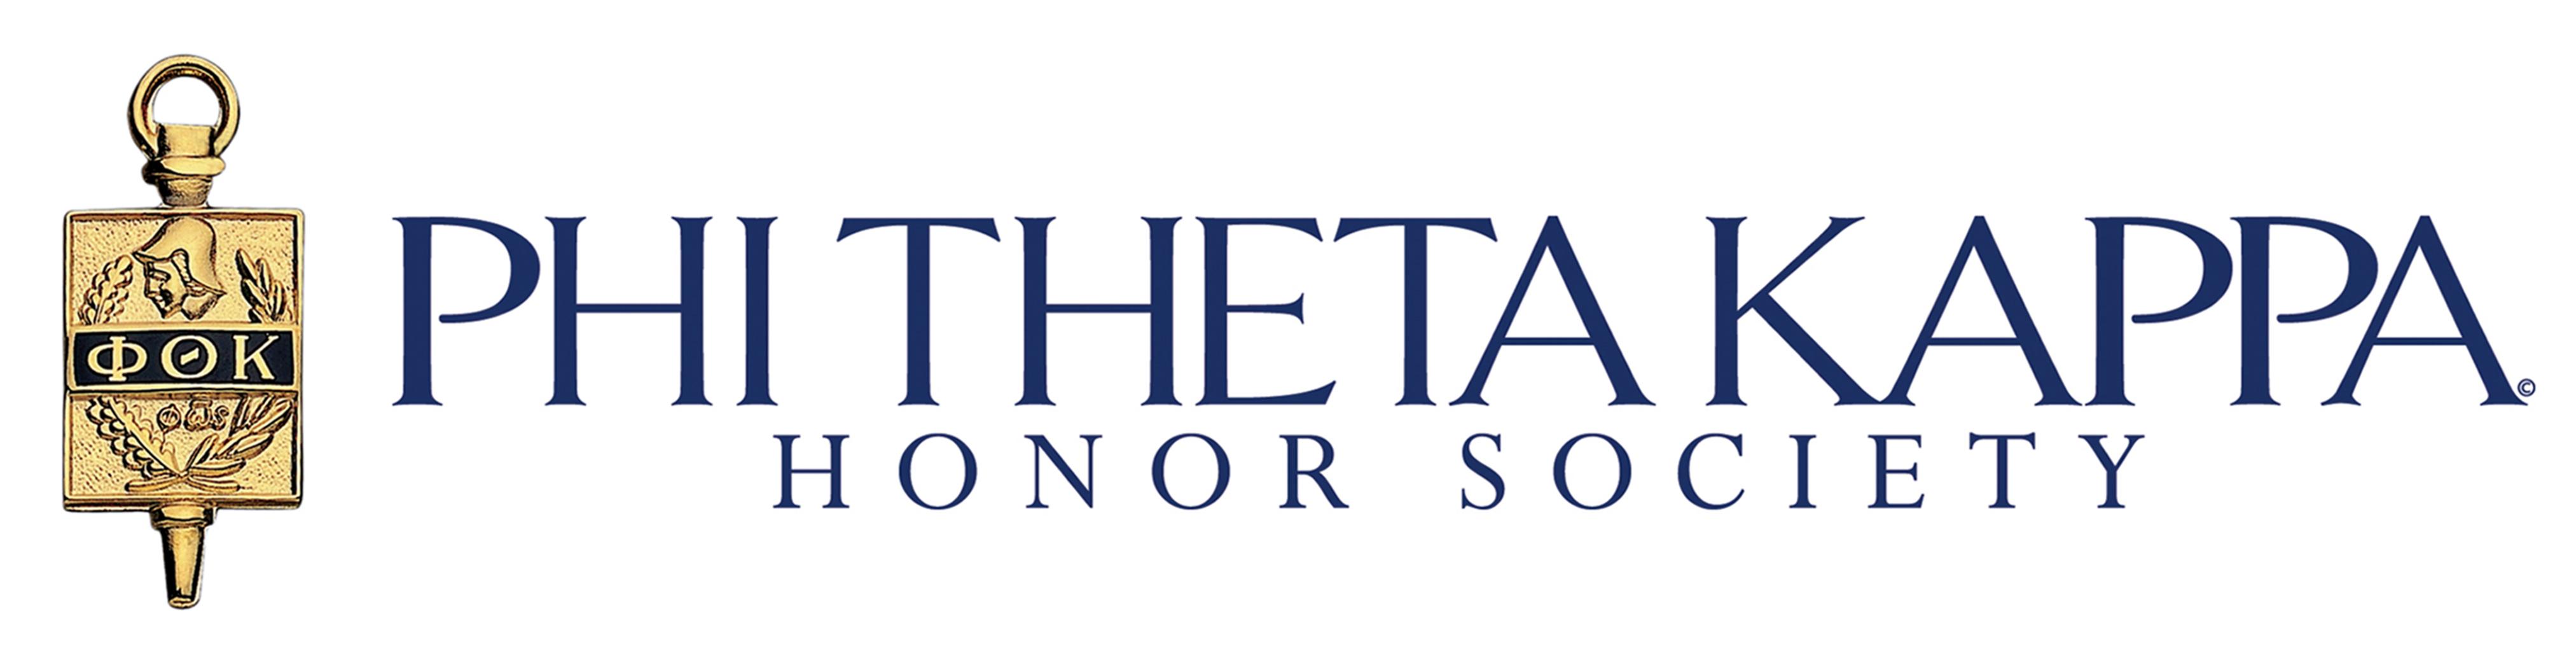 Phi Theta Kappa Honor Society Austin TX